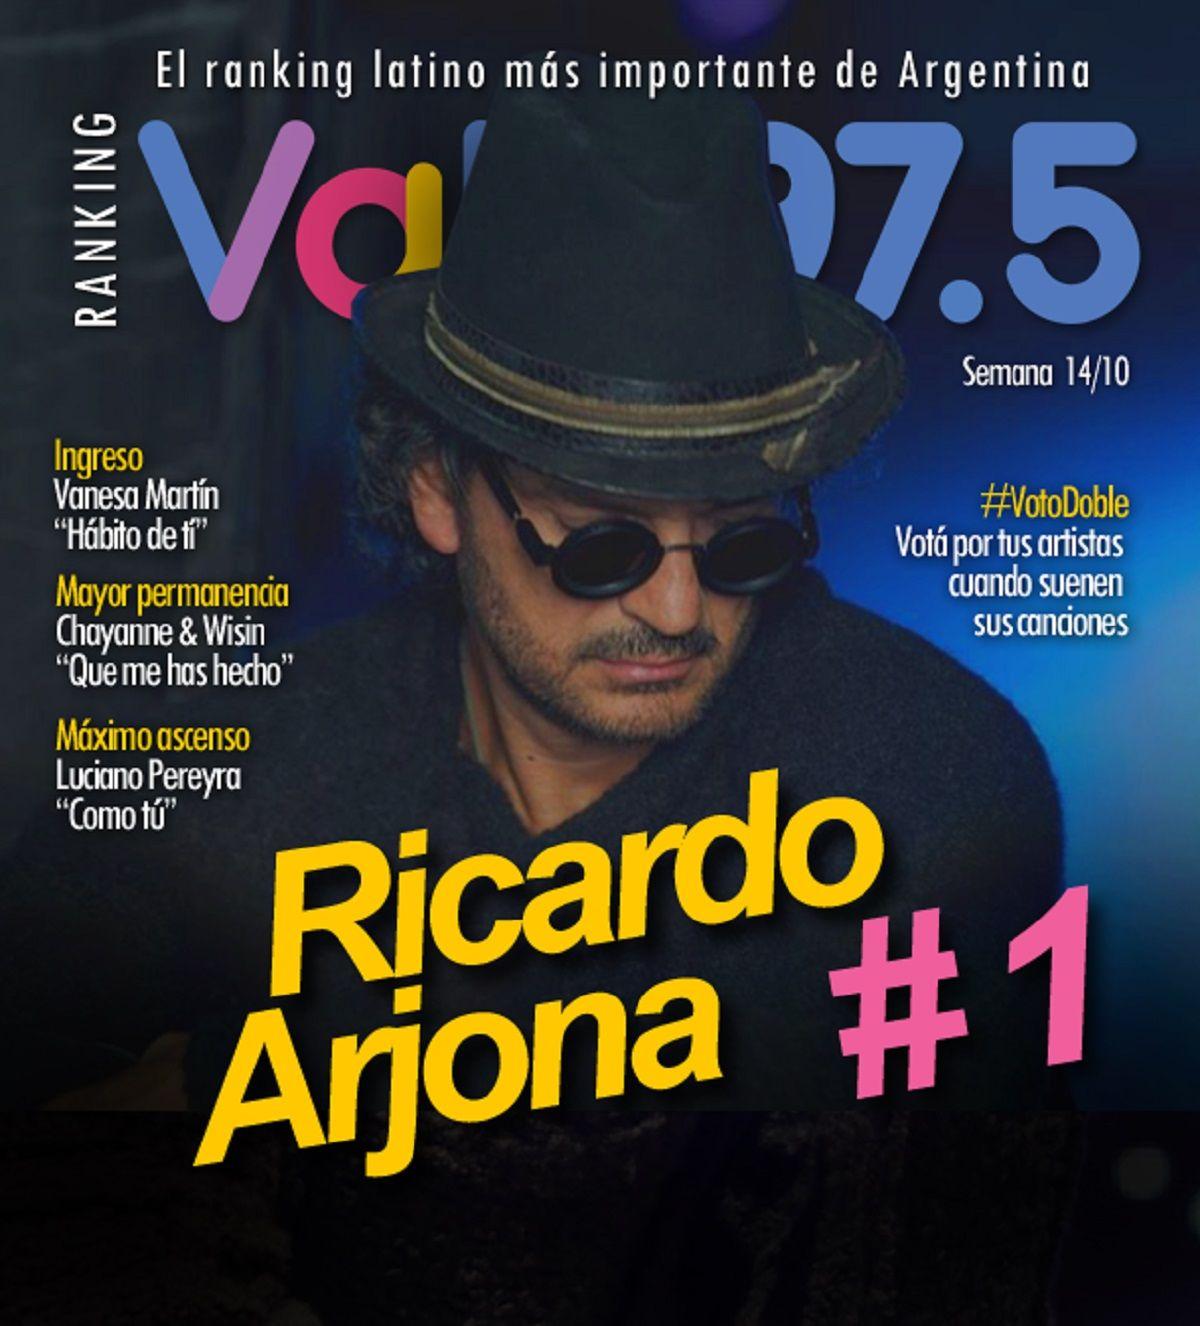 Ricardo Arjona, el rey del Ranking Vale